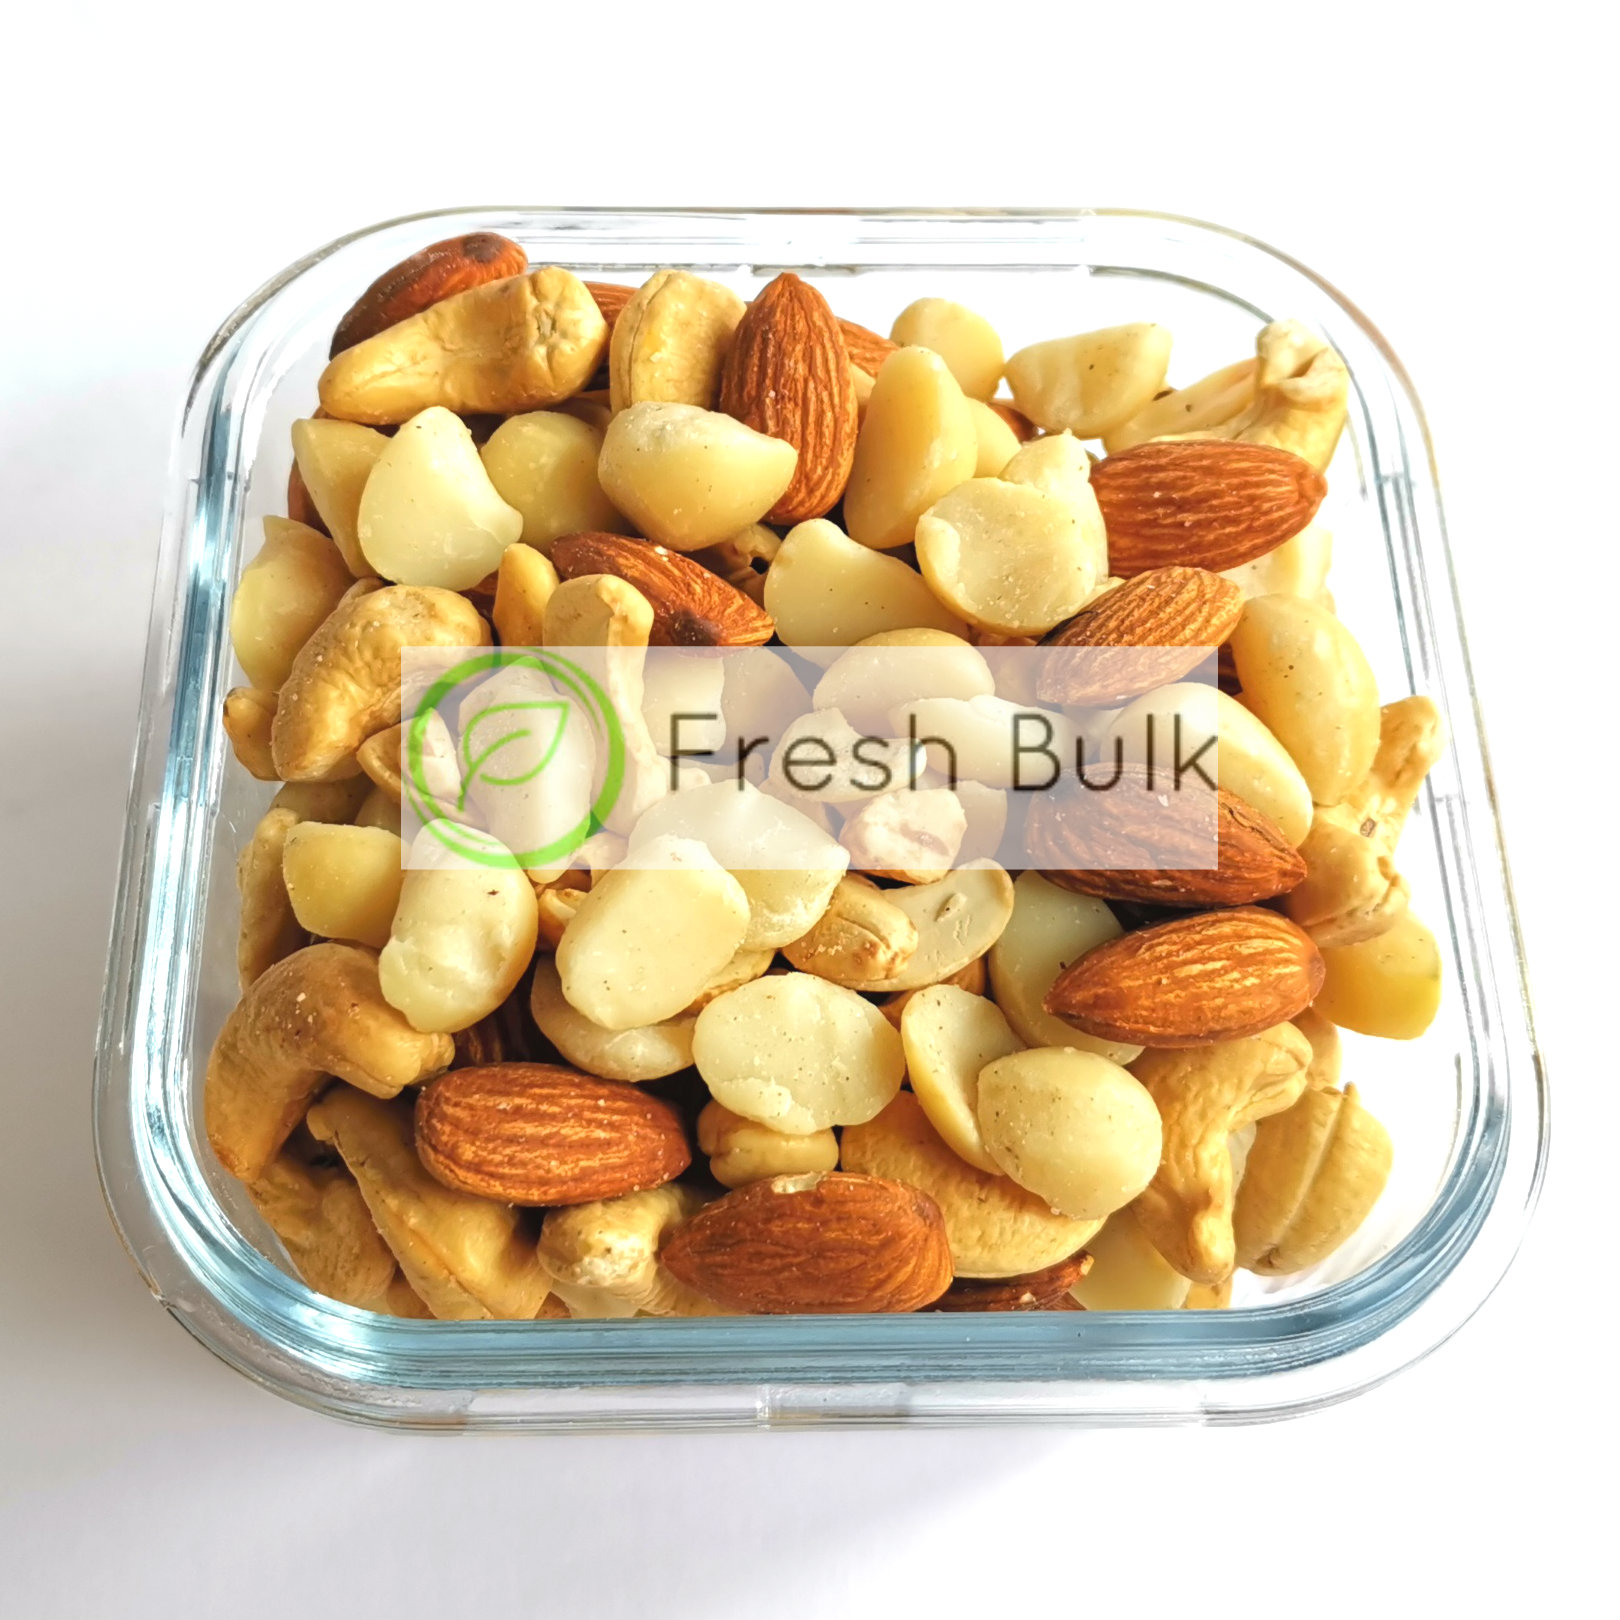 Fresh Bulk Omega 3 Nut Trail Mix 130g